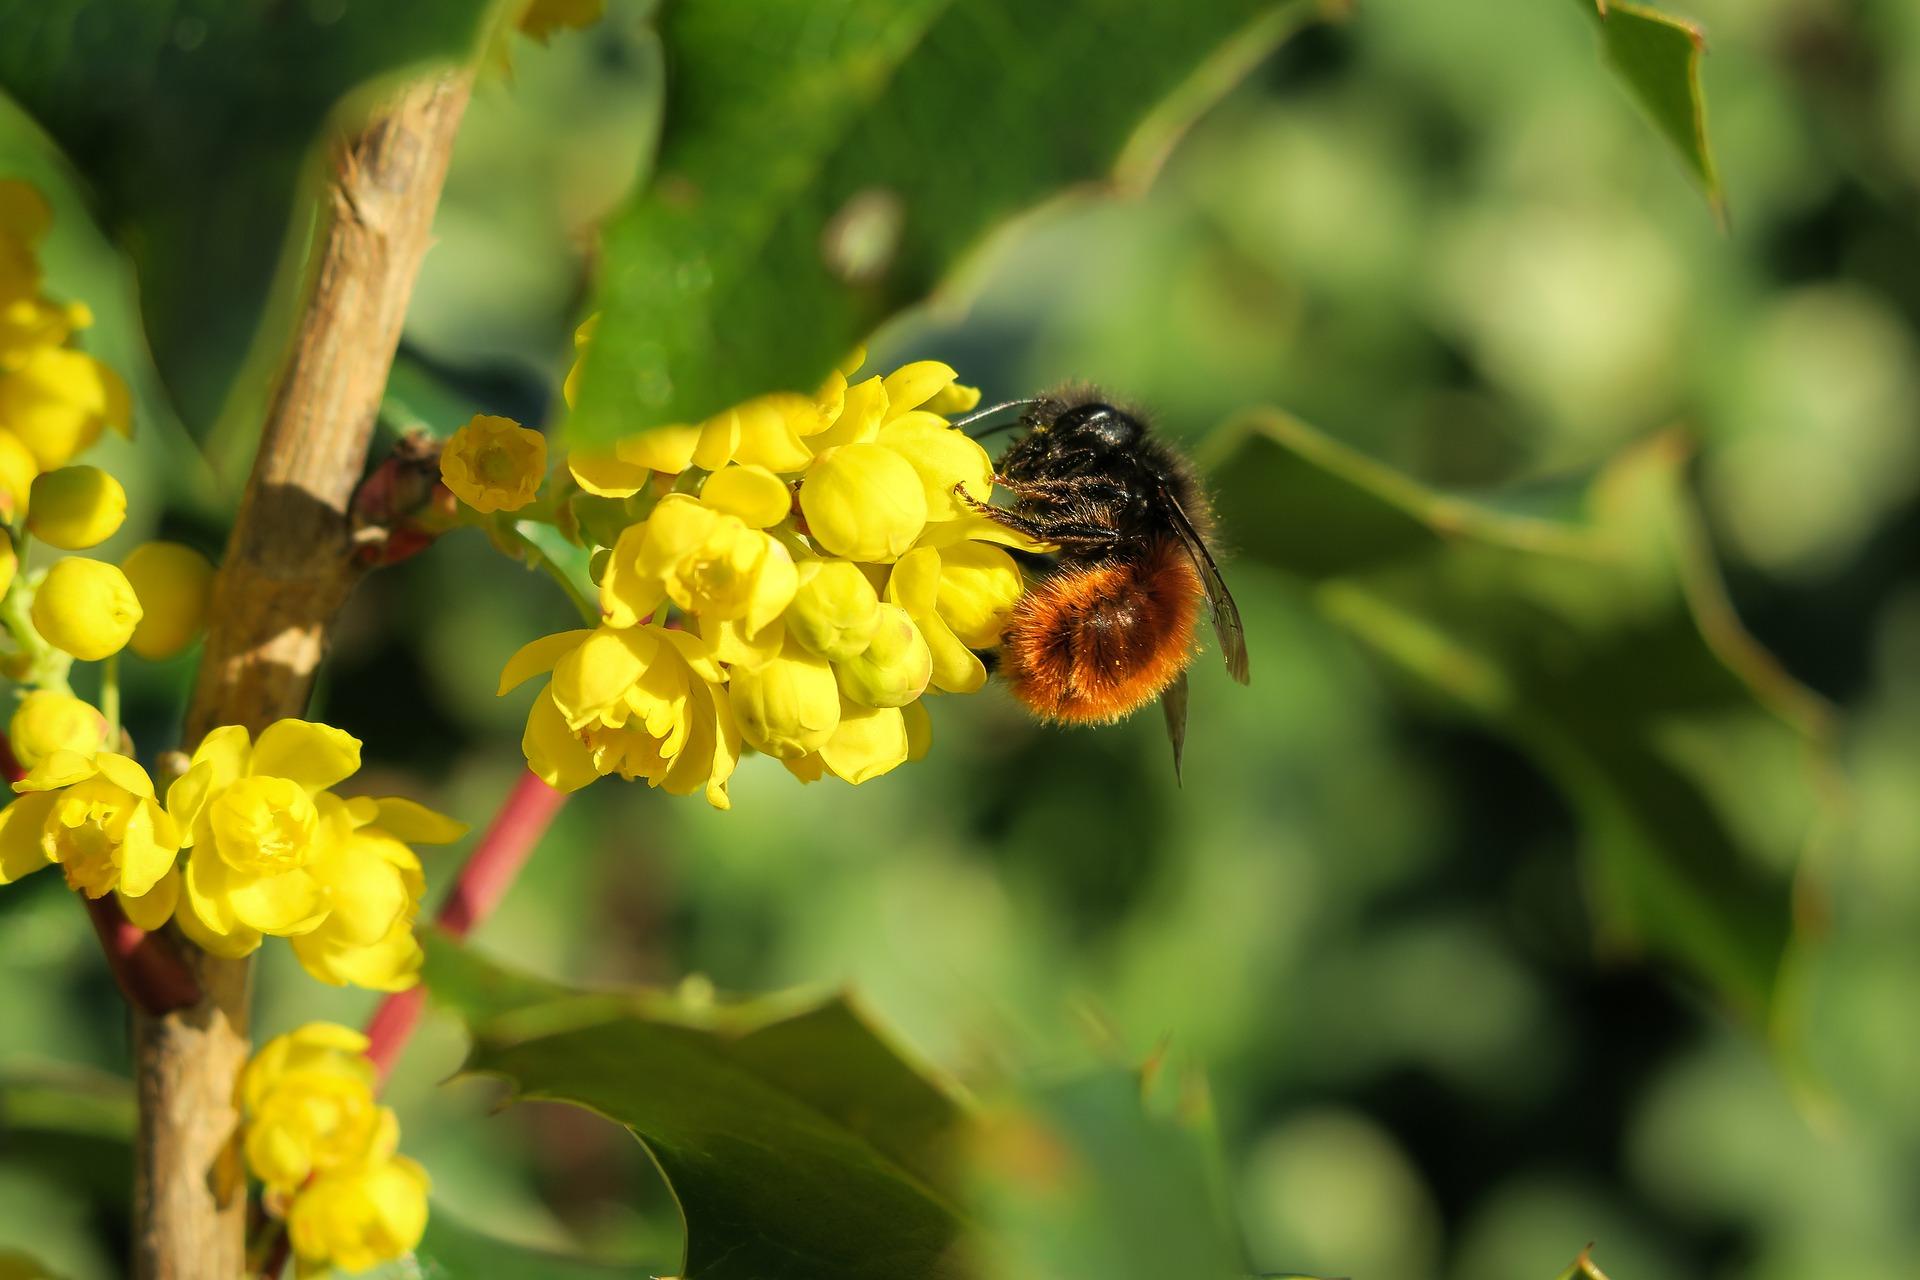 Die Gehörnte Mauerbiene – Ein pelziger Frühlingsbote